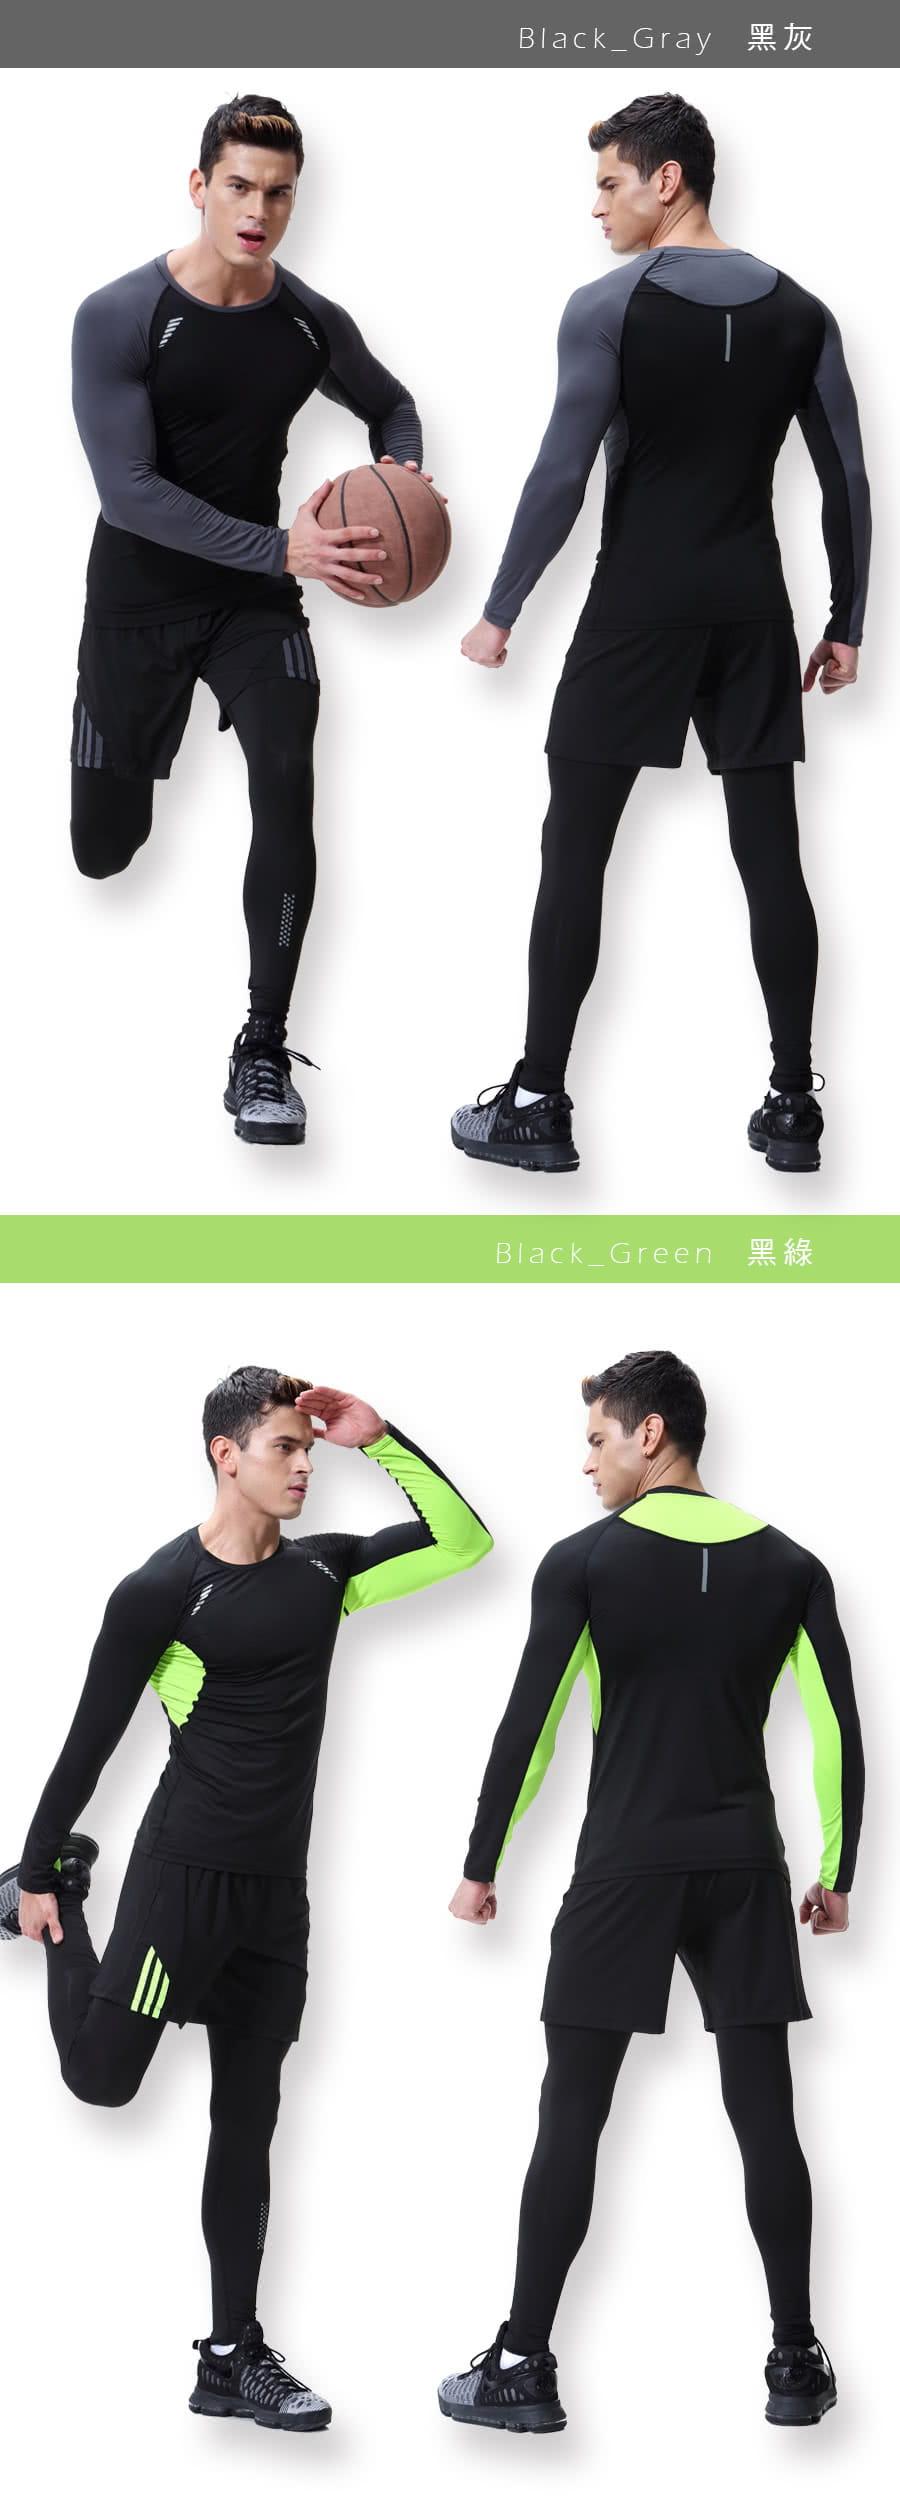 【Un-Sport高機能】型男專業吸排速乾三件式運動套組(長袖+短褲+緊身長褲) 8